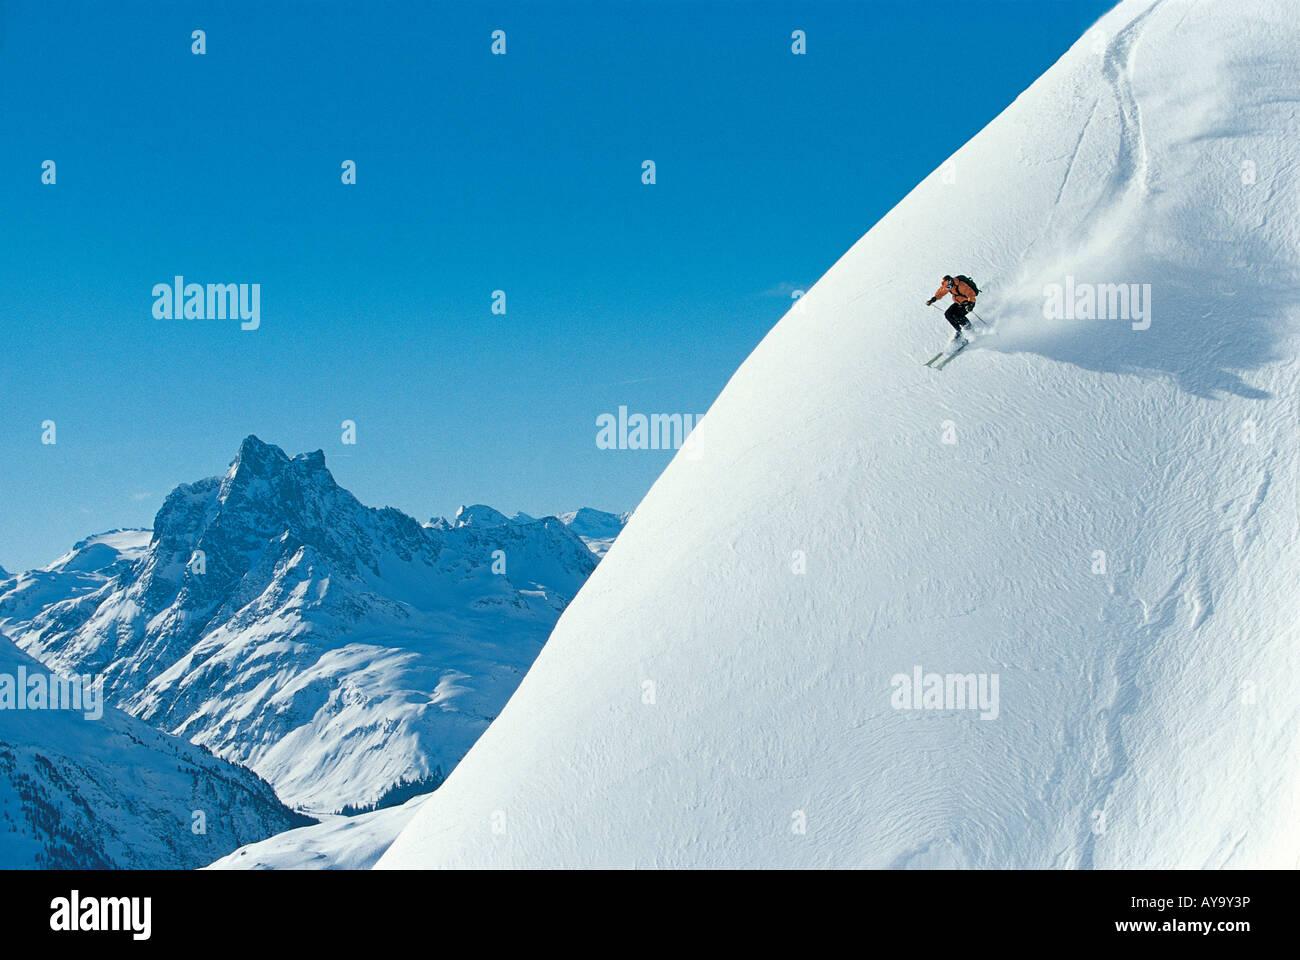 Off piste skier on steep incline, St Anton Am Arlberg, Tyrol, Austria - Stock Image